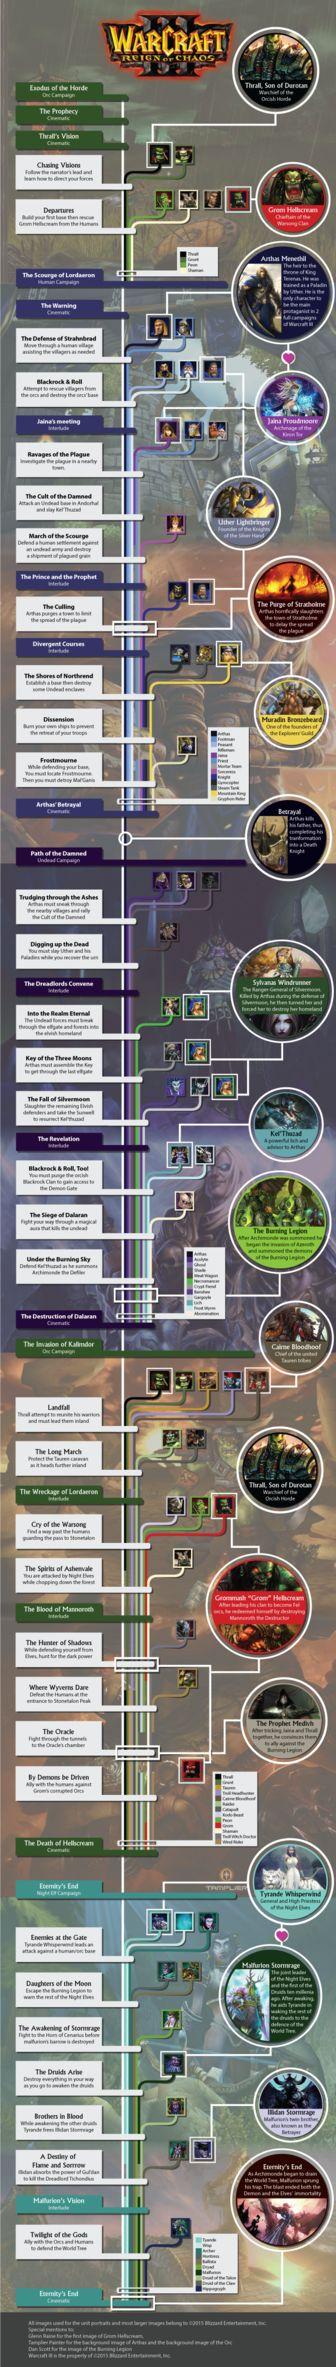 Timeline+of+the+Warcraft+3+Campaign+by+BlueNic.deviantart.com+on+@DeviantArt